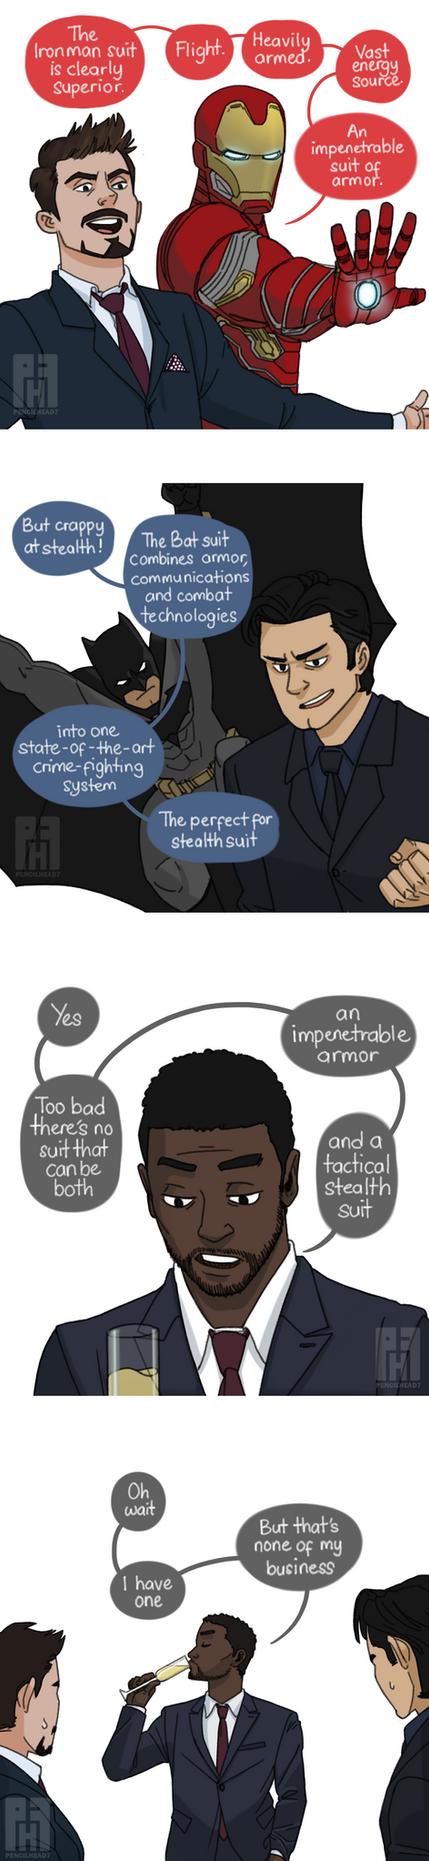 Stark vs Wayne 2 by pencilHead7